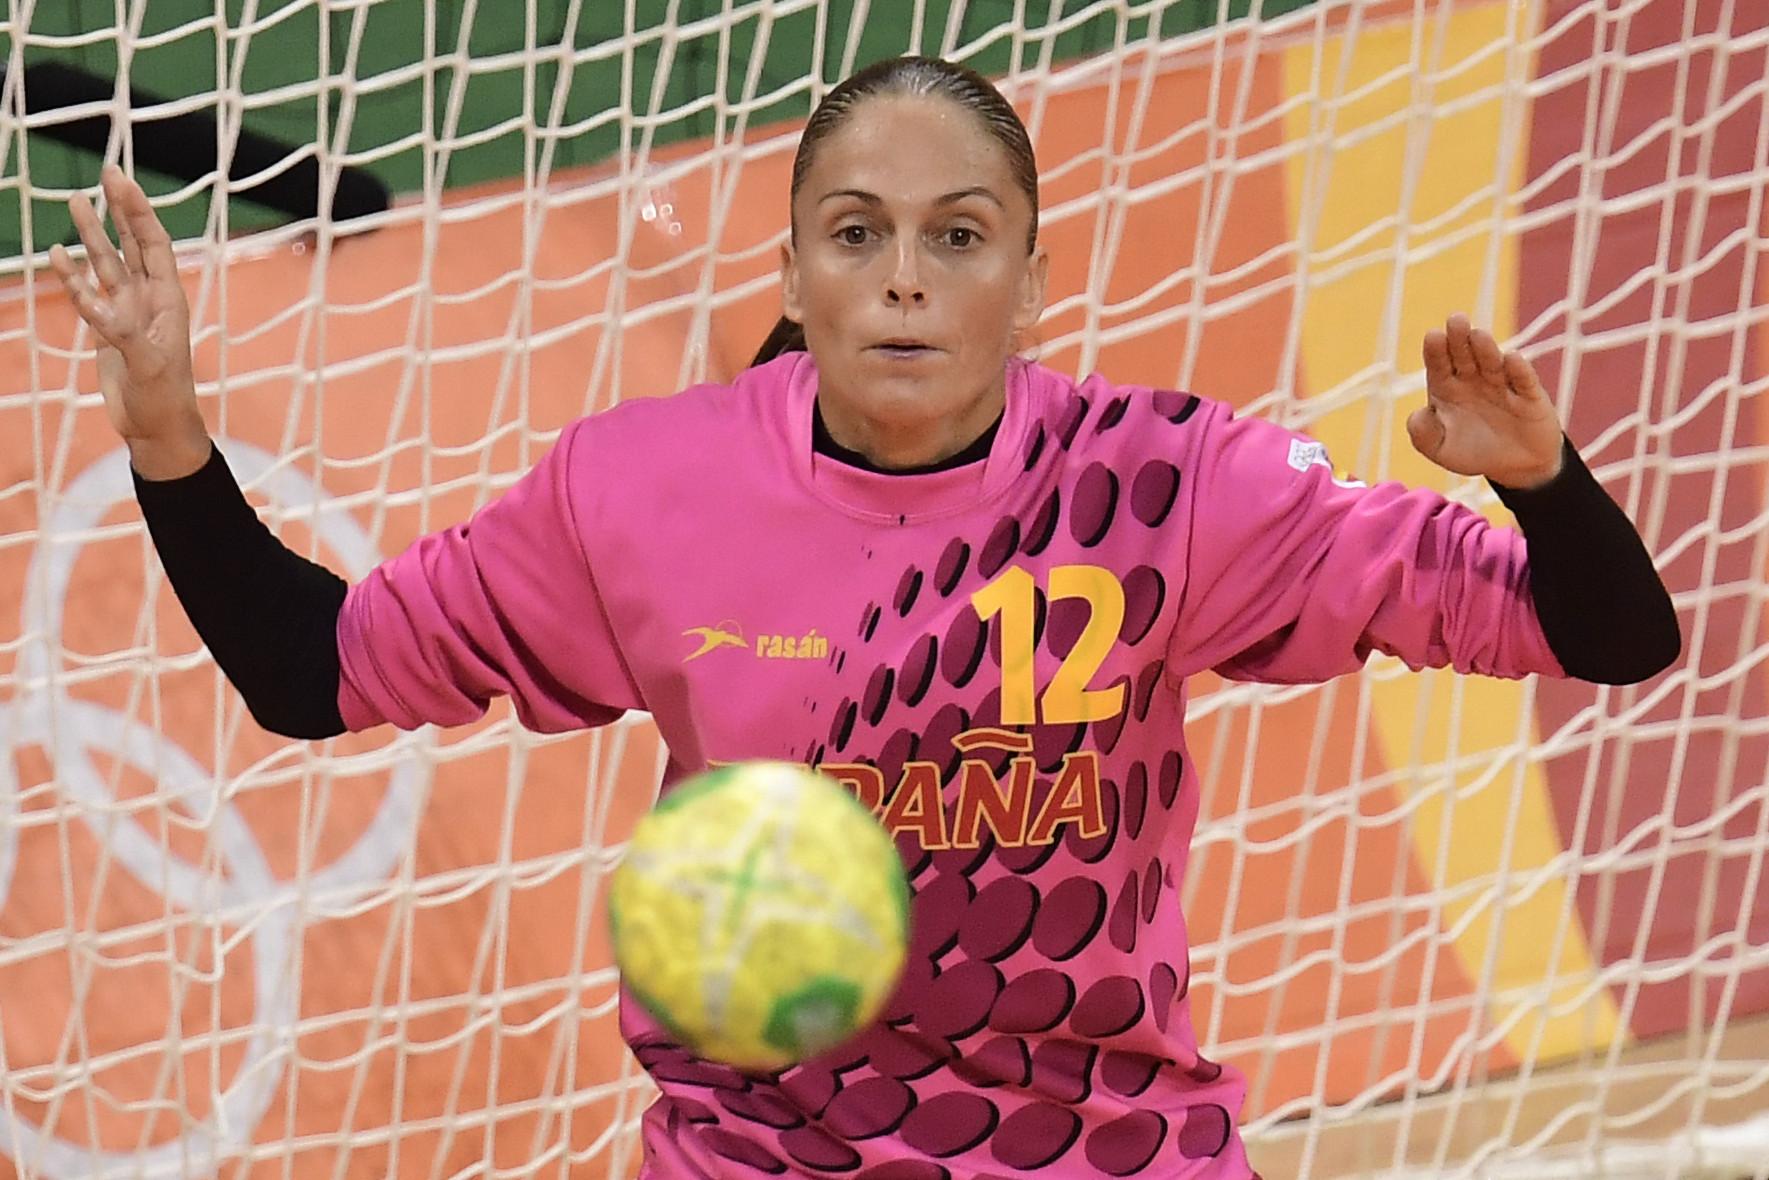 Spanish handball captains donate jerseys to Red Cross appeal